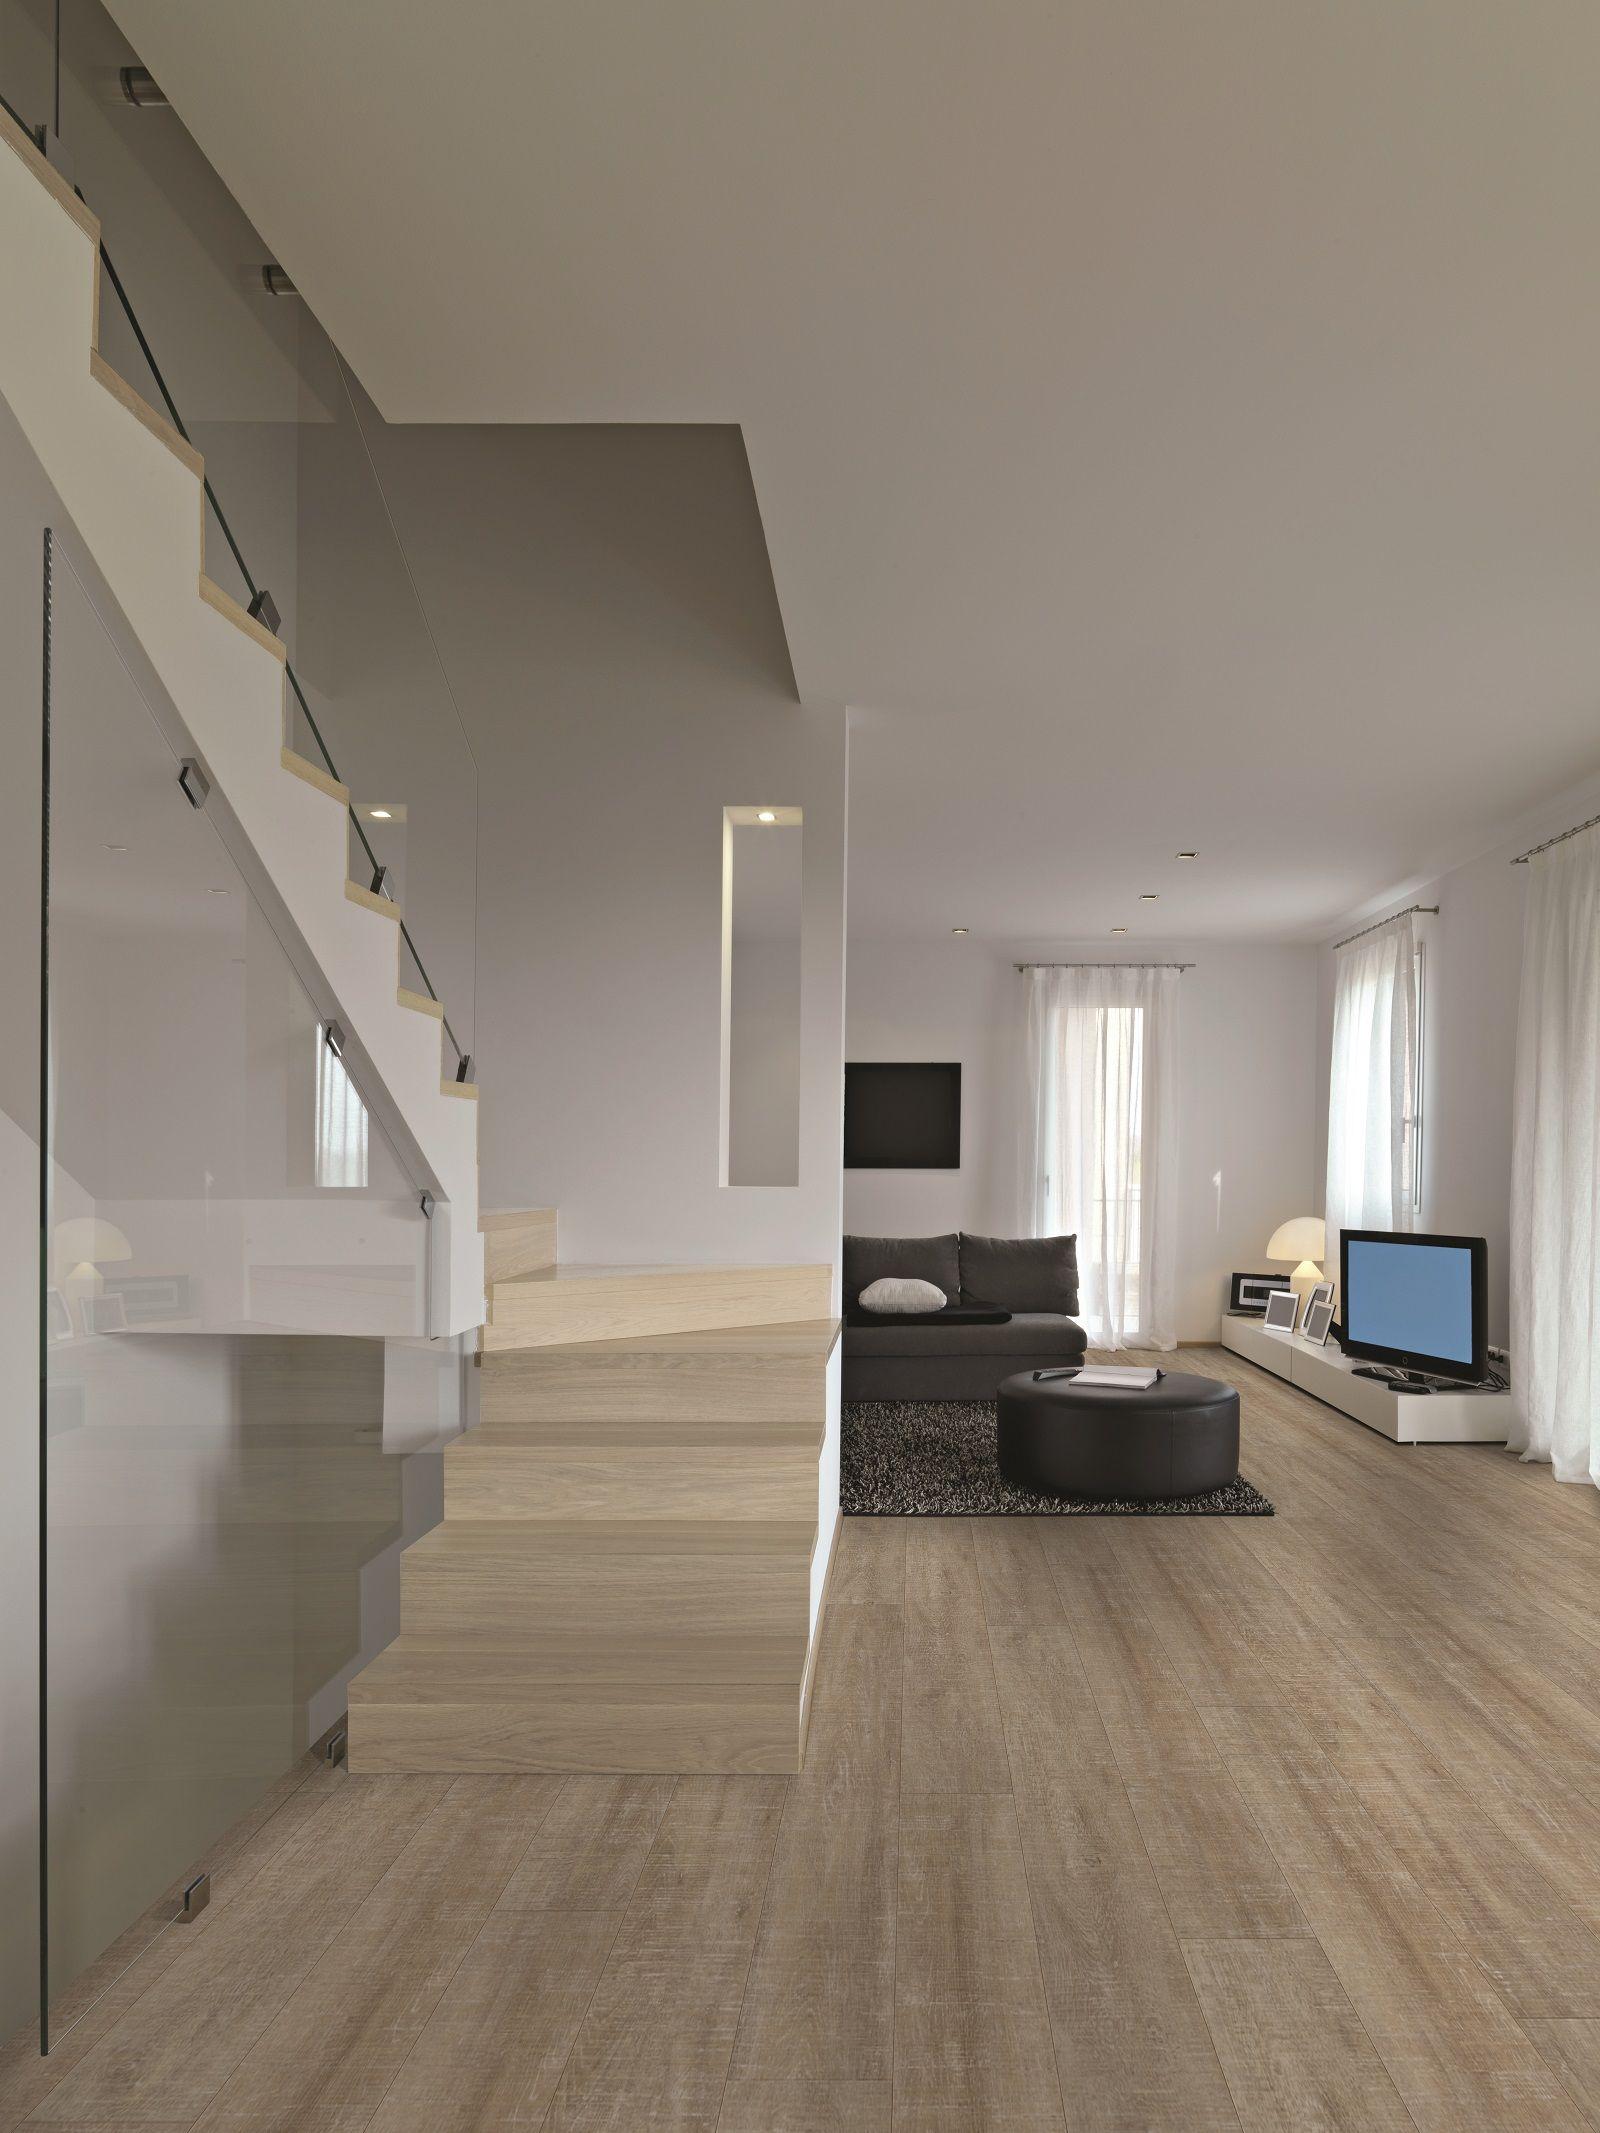 rubber flooring reviews tarkett design installing lowes best to how price swiftlock floor with laminate install hardwood waterproof pergo installation